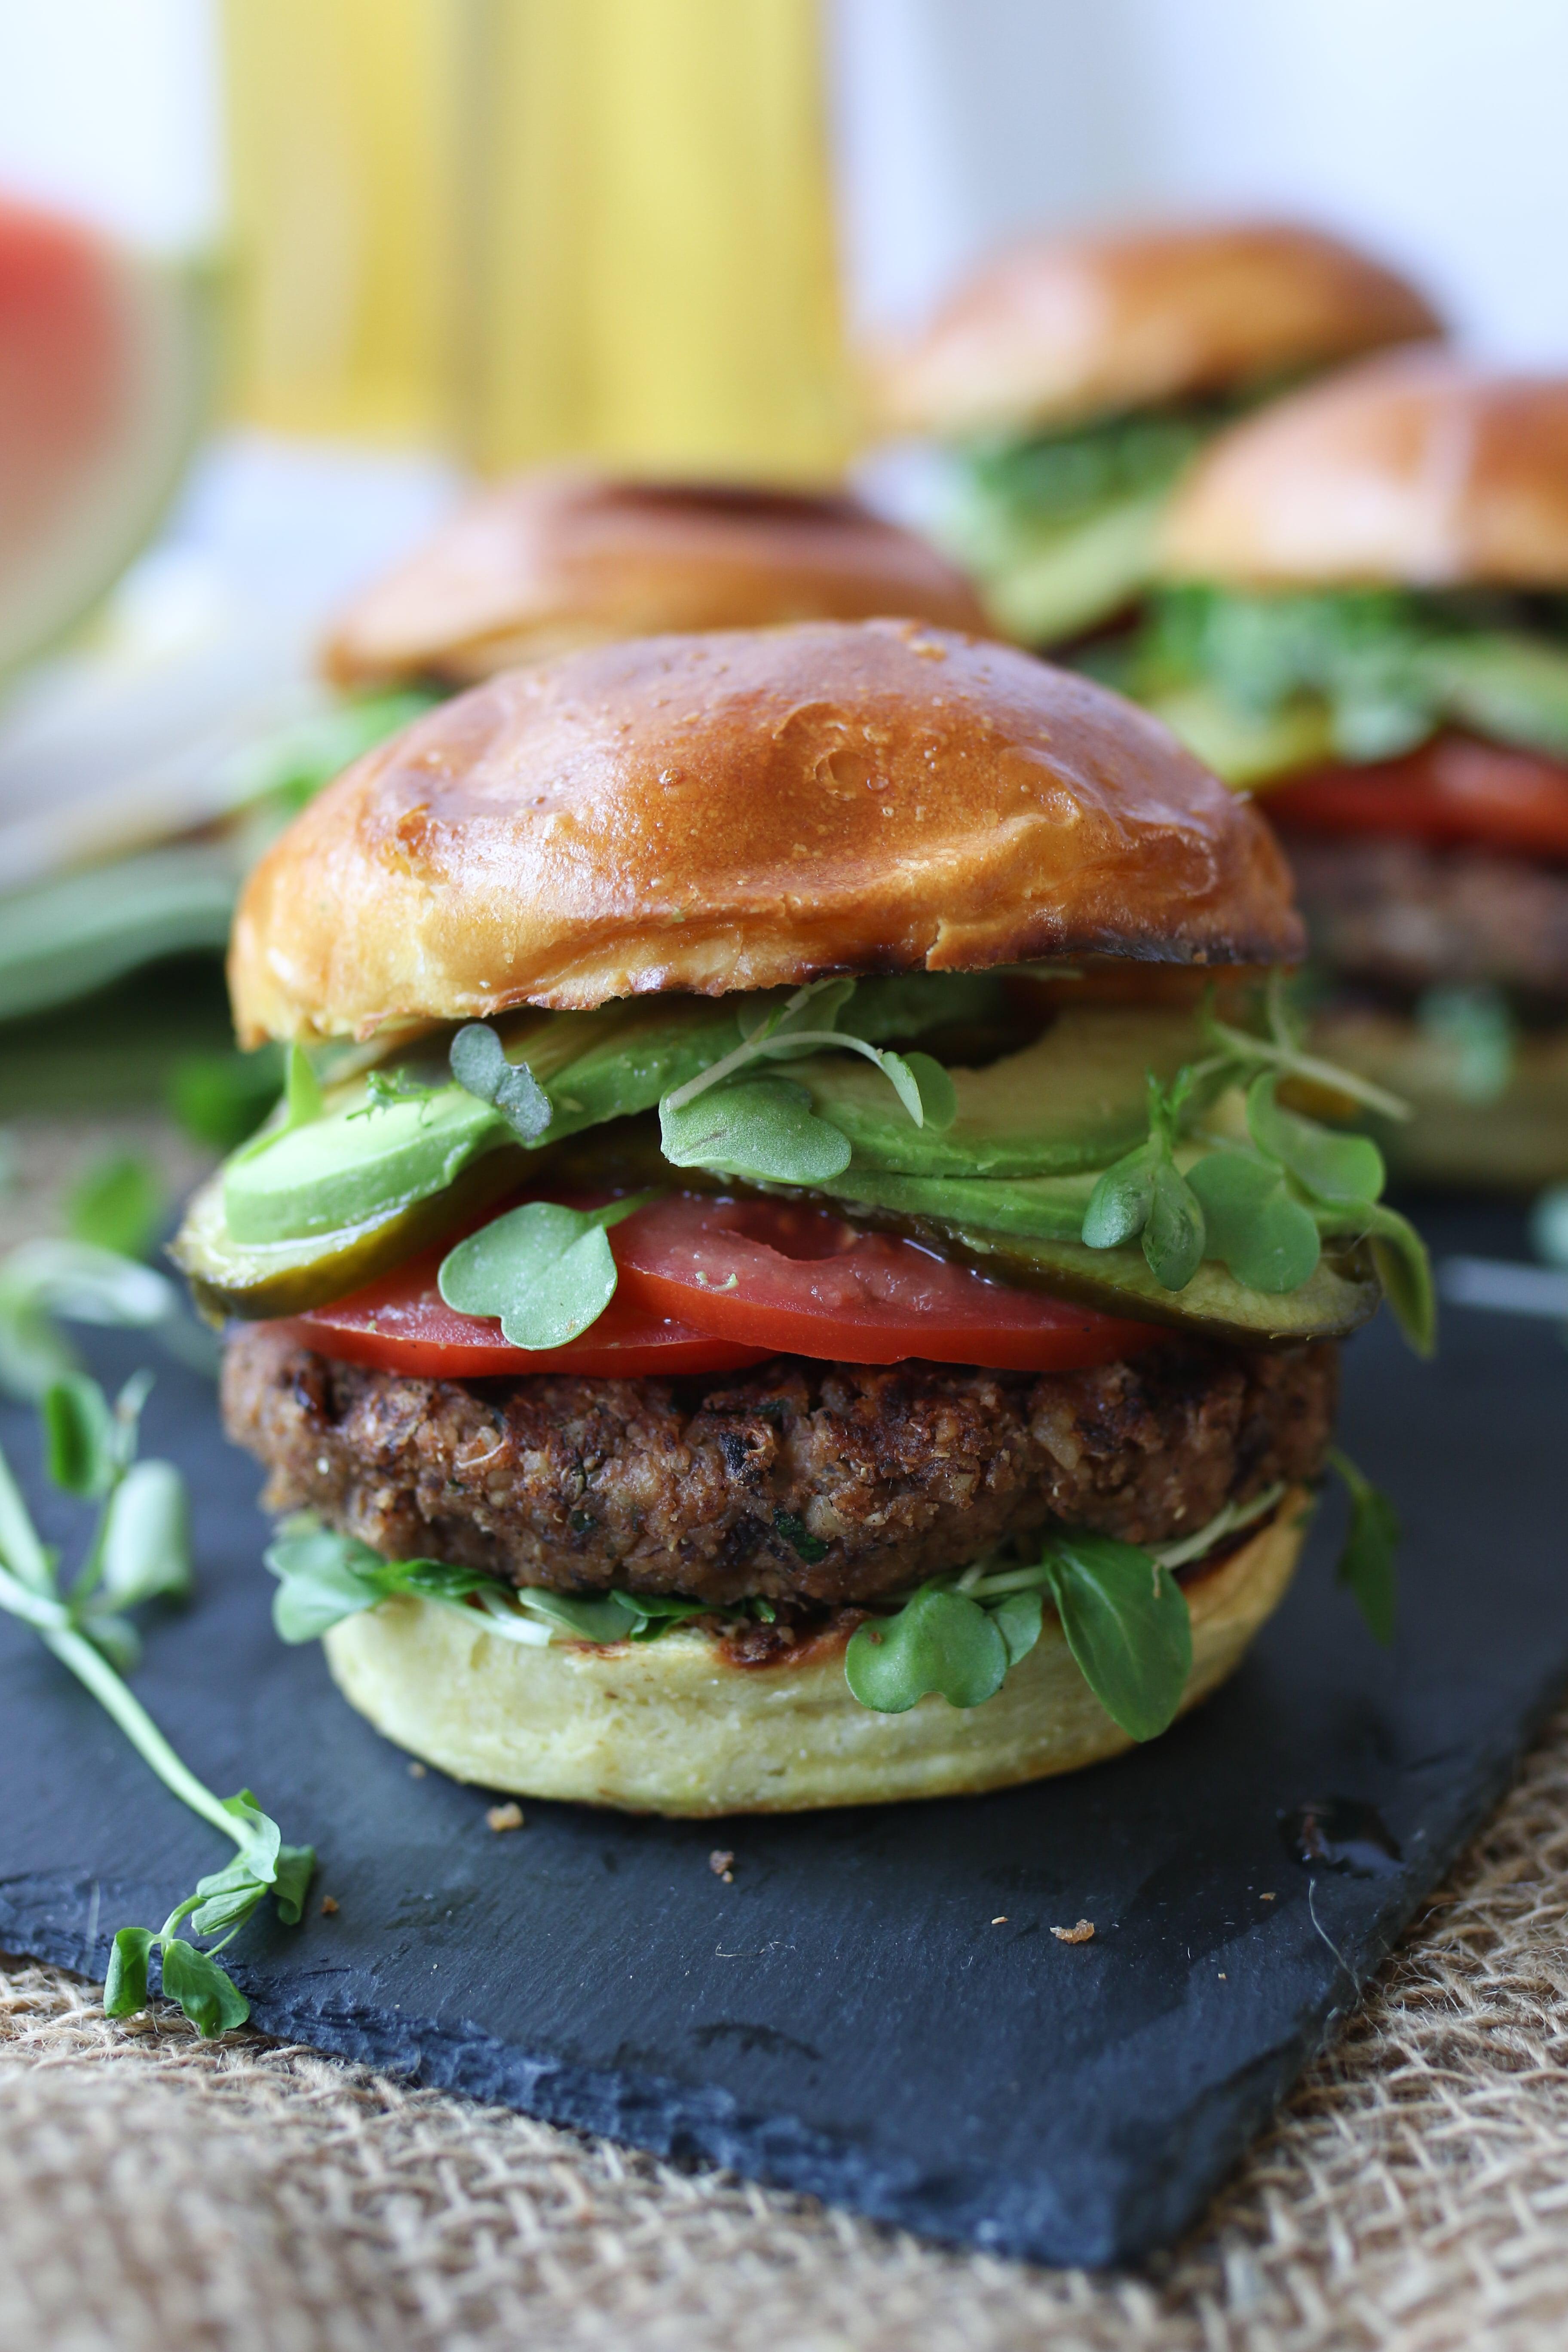 A close up photo of a burger.